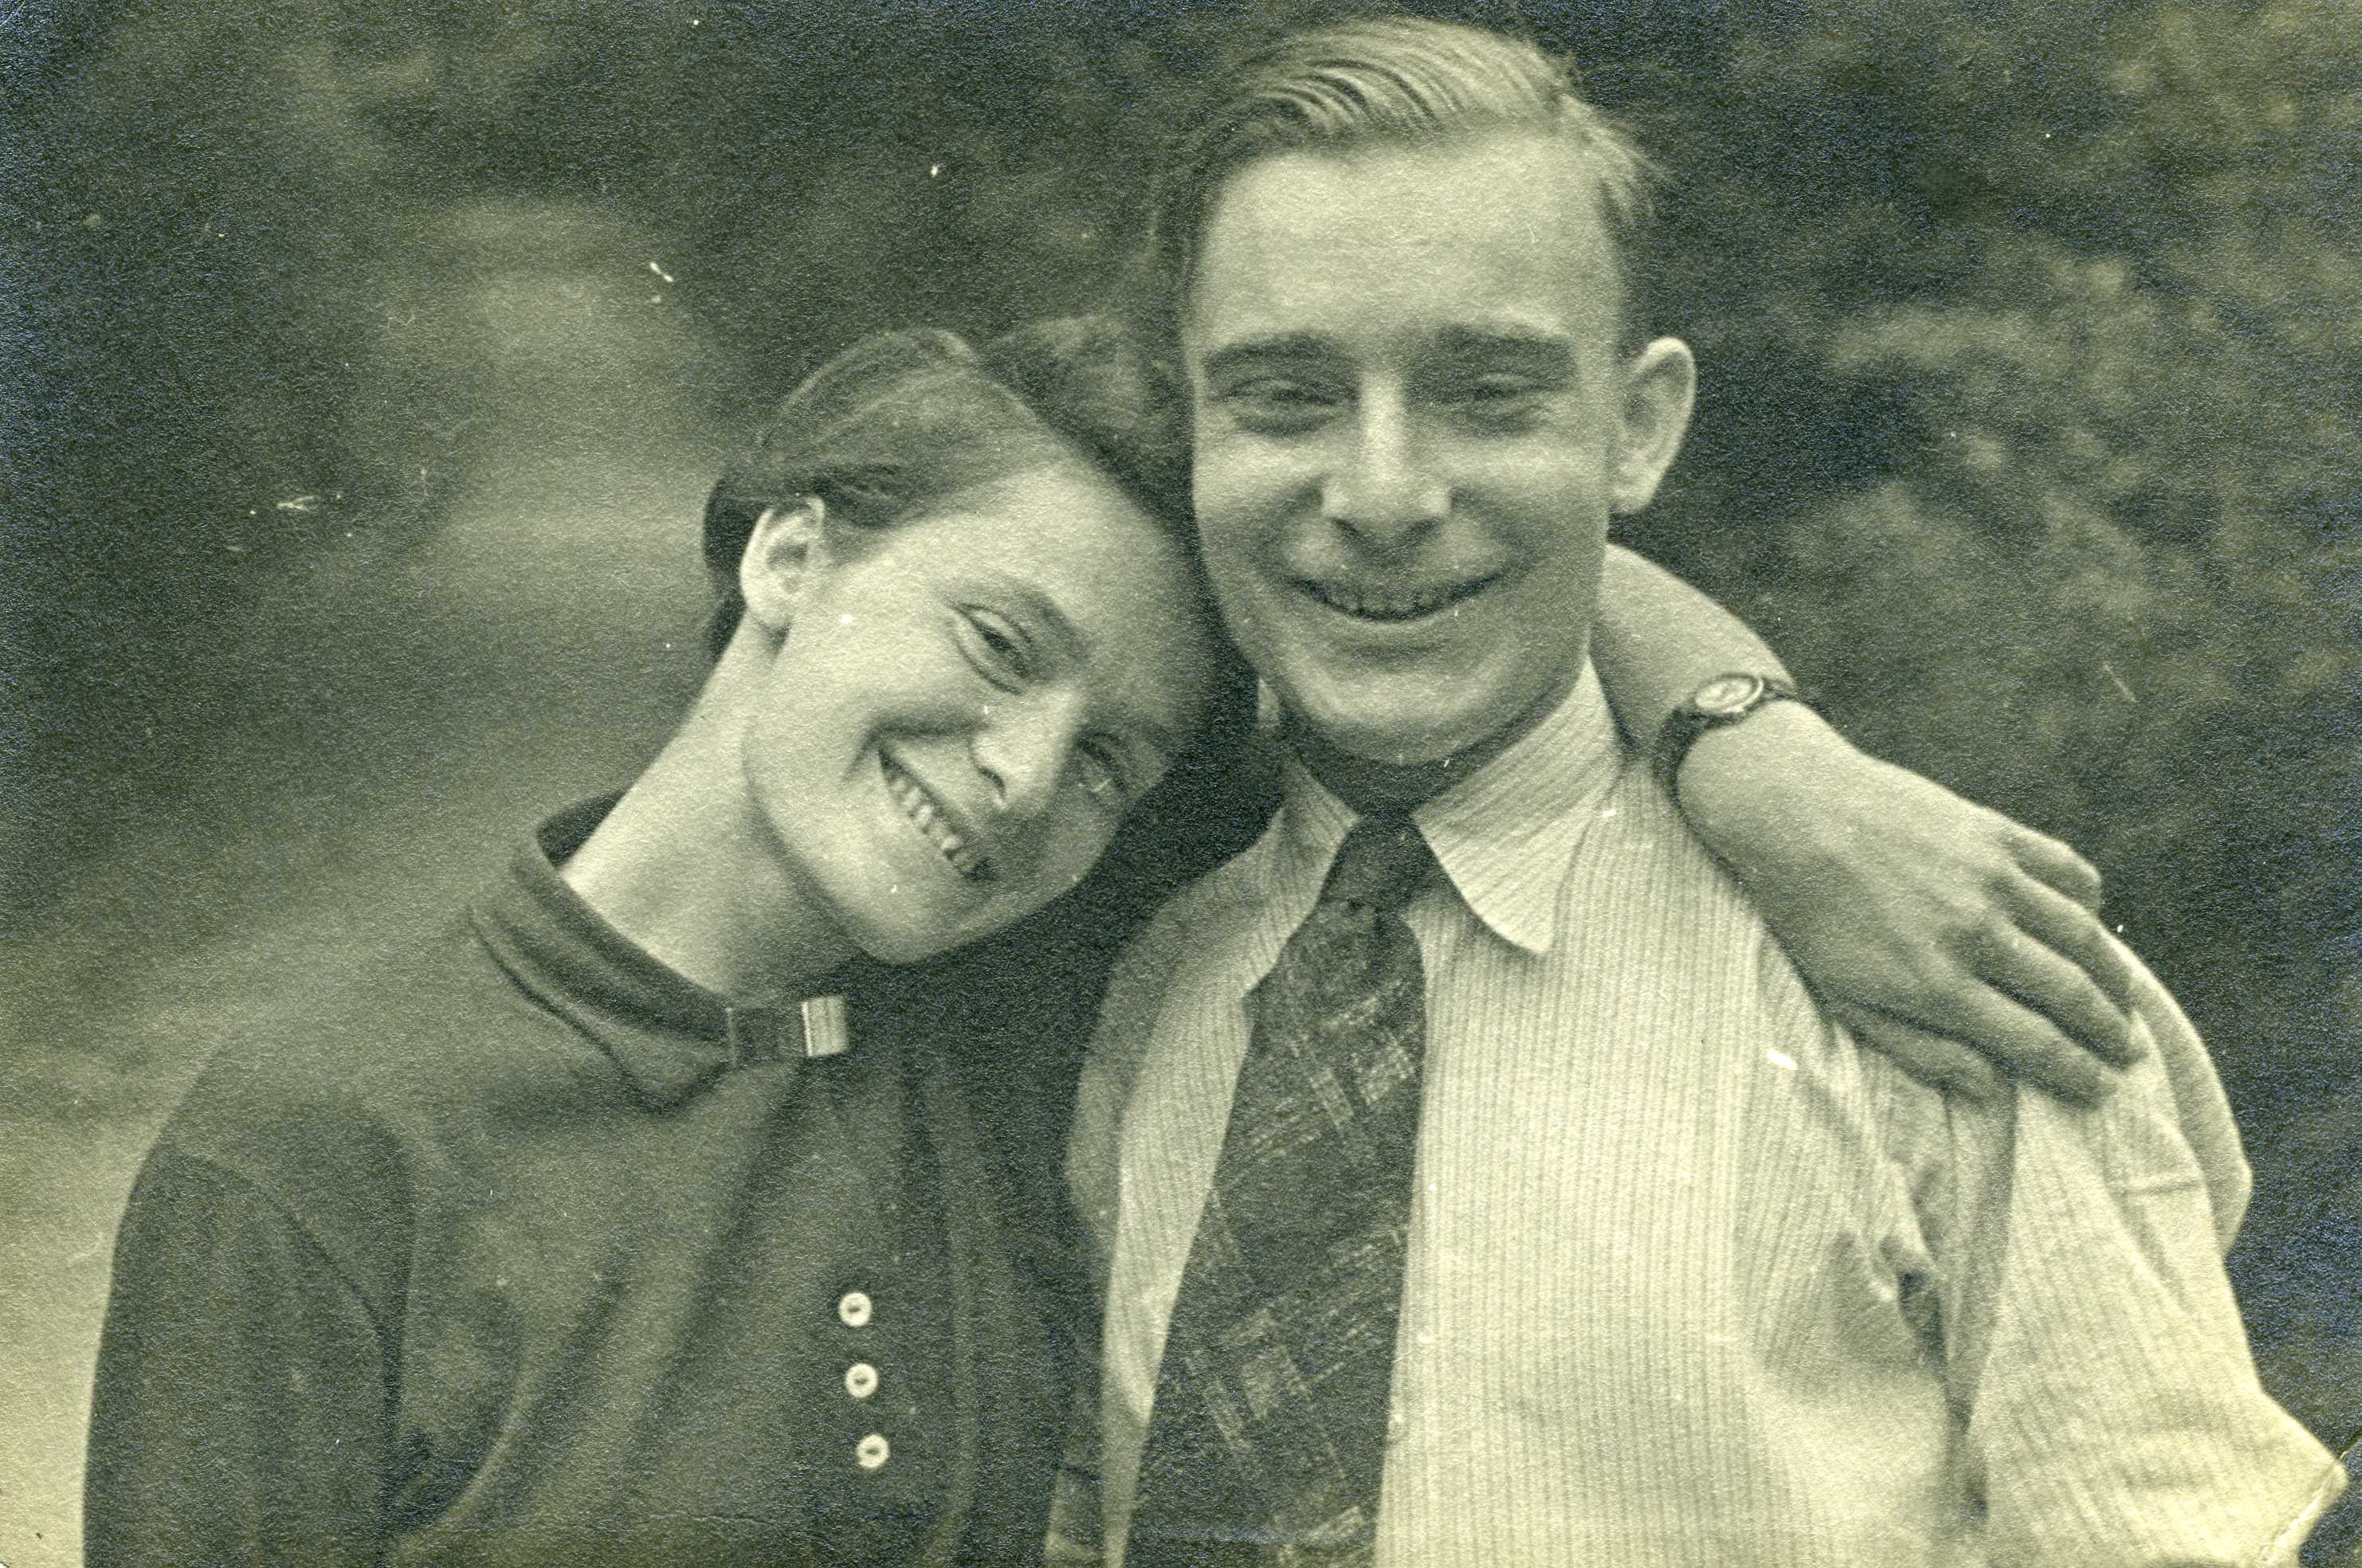 Muschi and Fritz Daniel, 1934